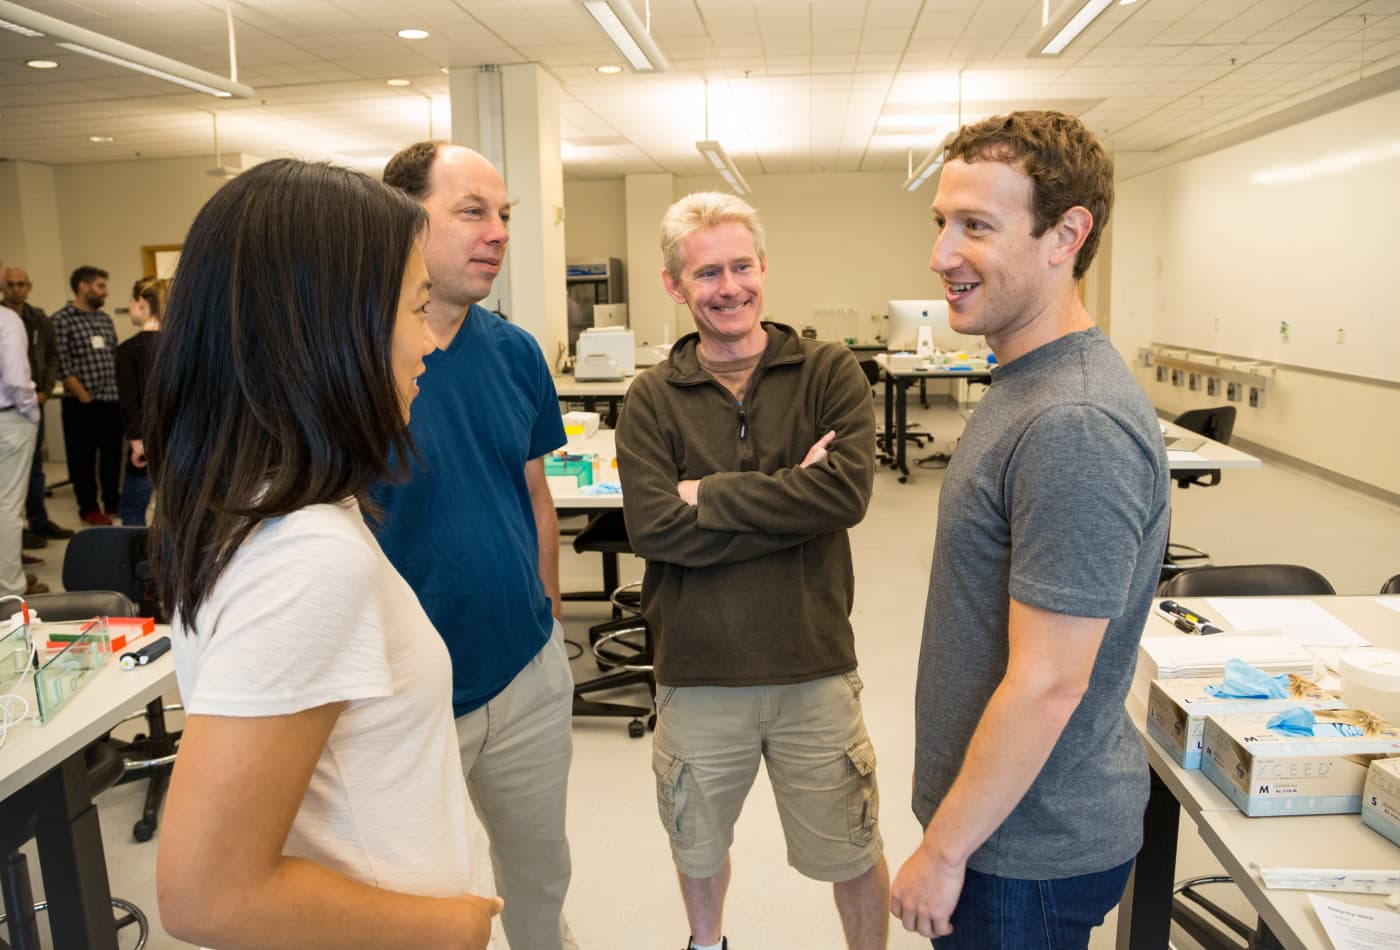 Chan Zuckerberg Initiative: What is it doing so far?